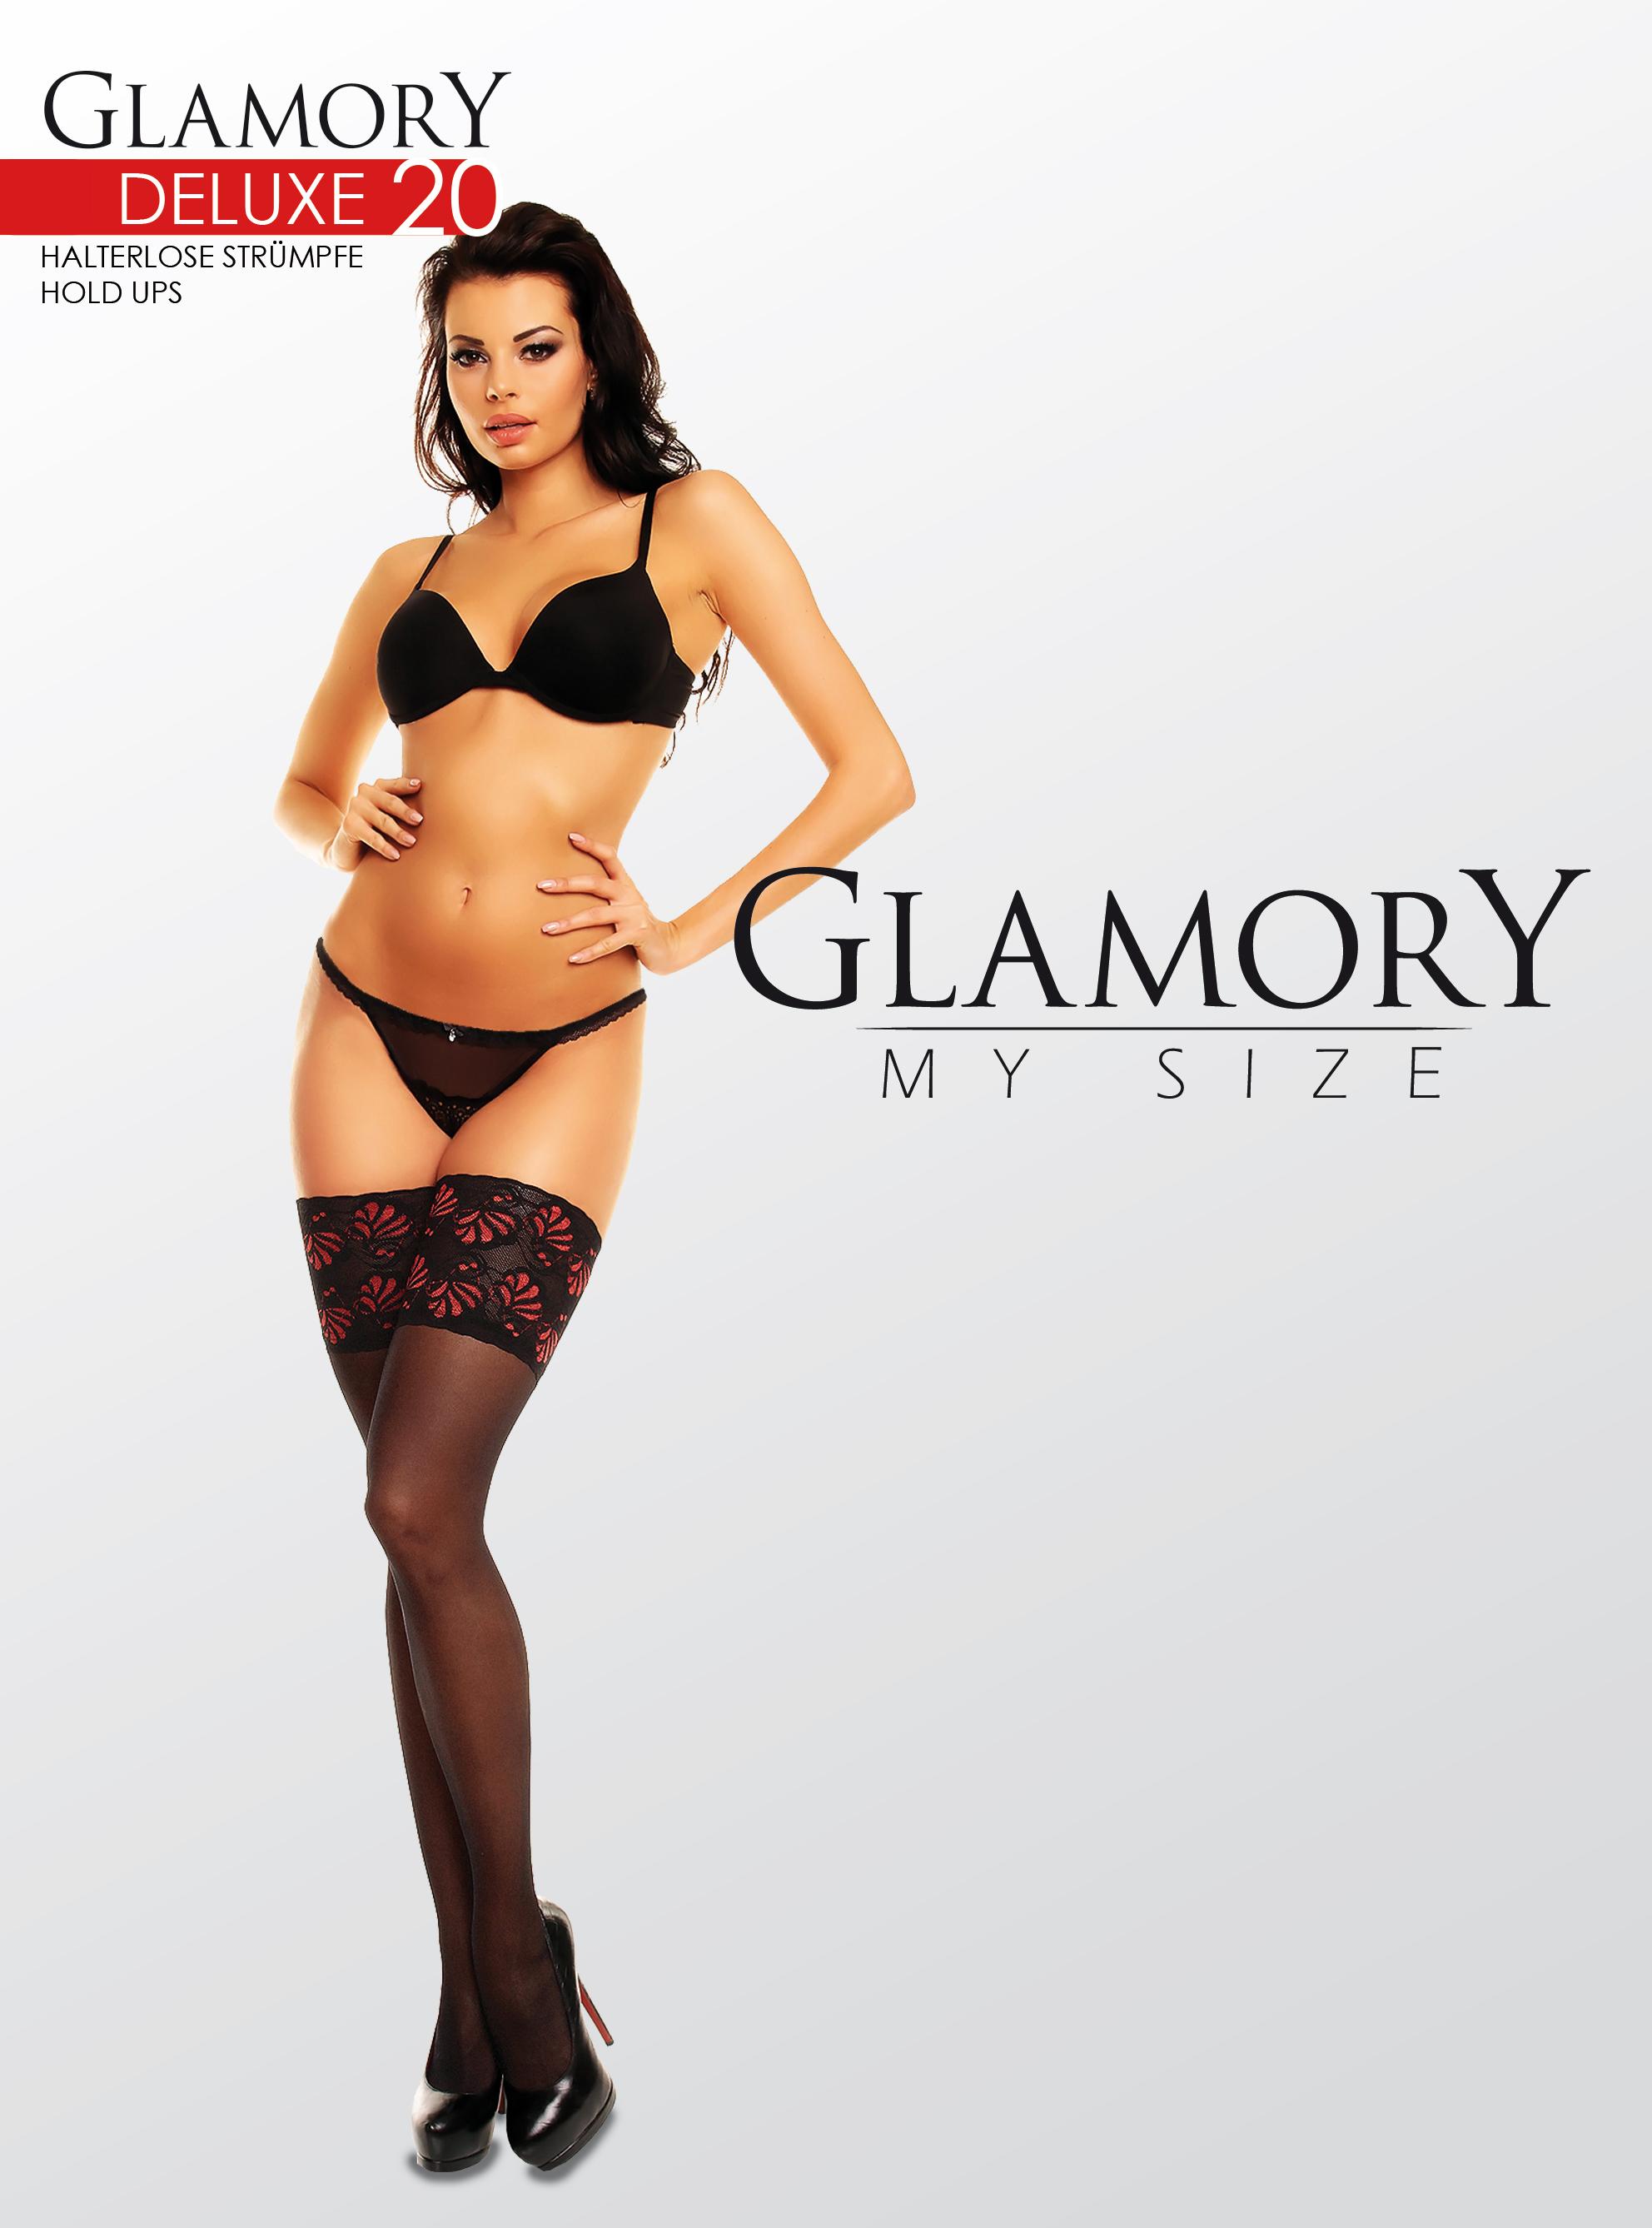 b5ac5a55c Glamory - Elegant plus size hold ups Deluxe 20 denier   9989